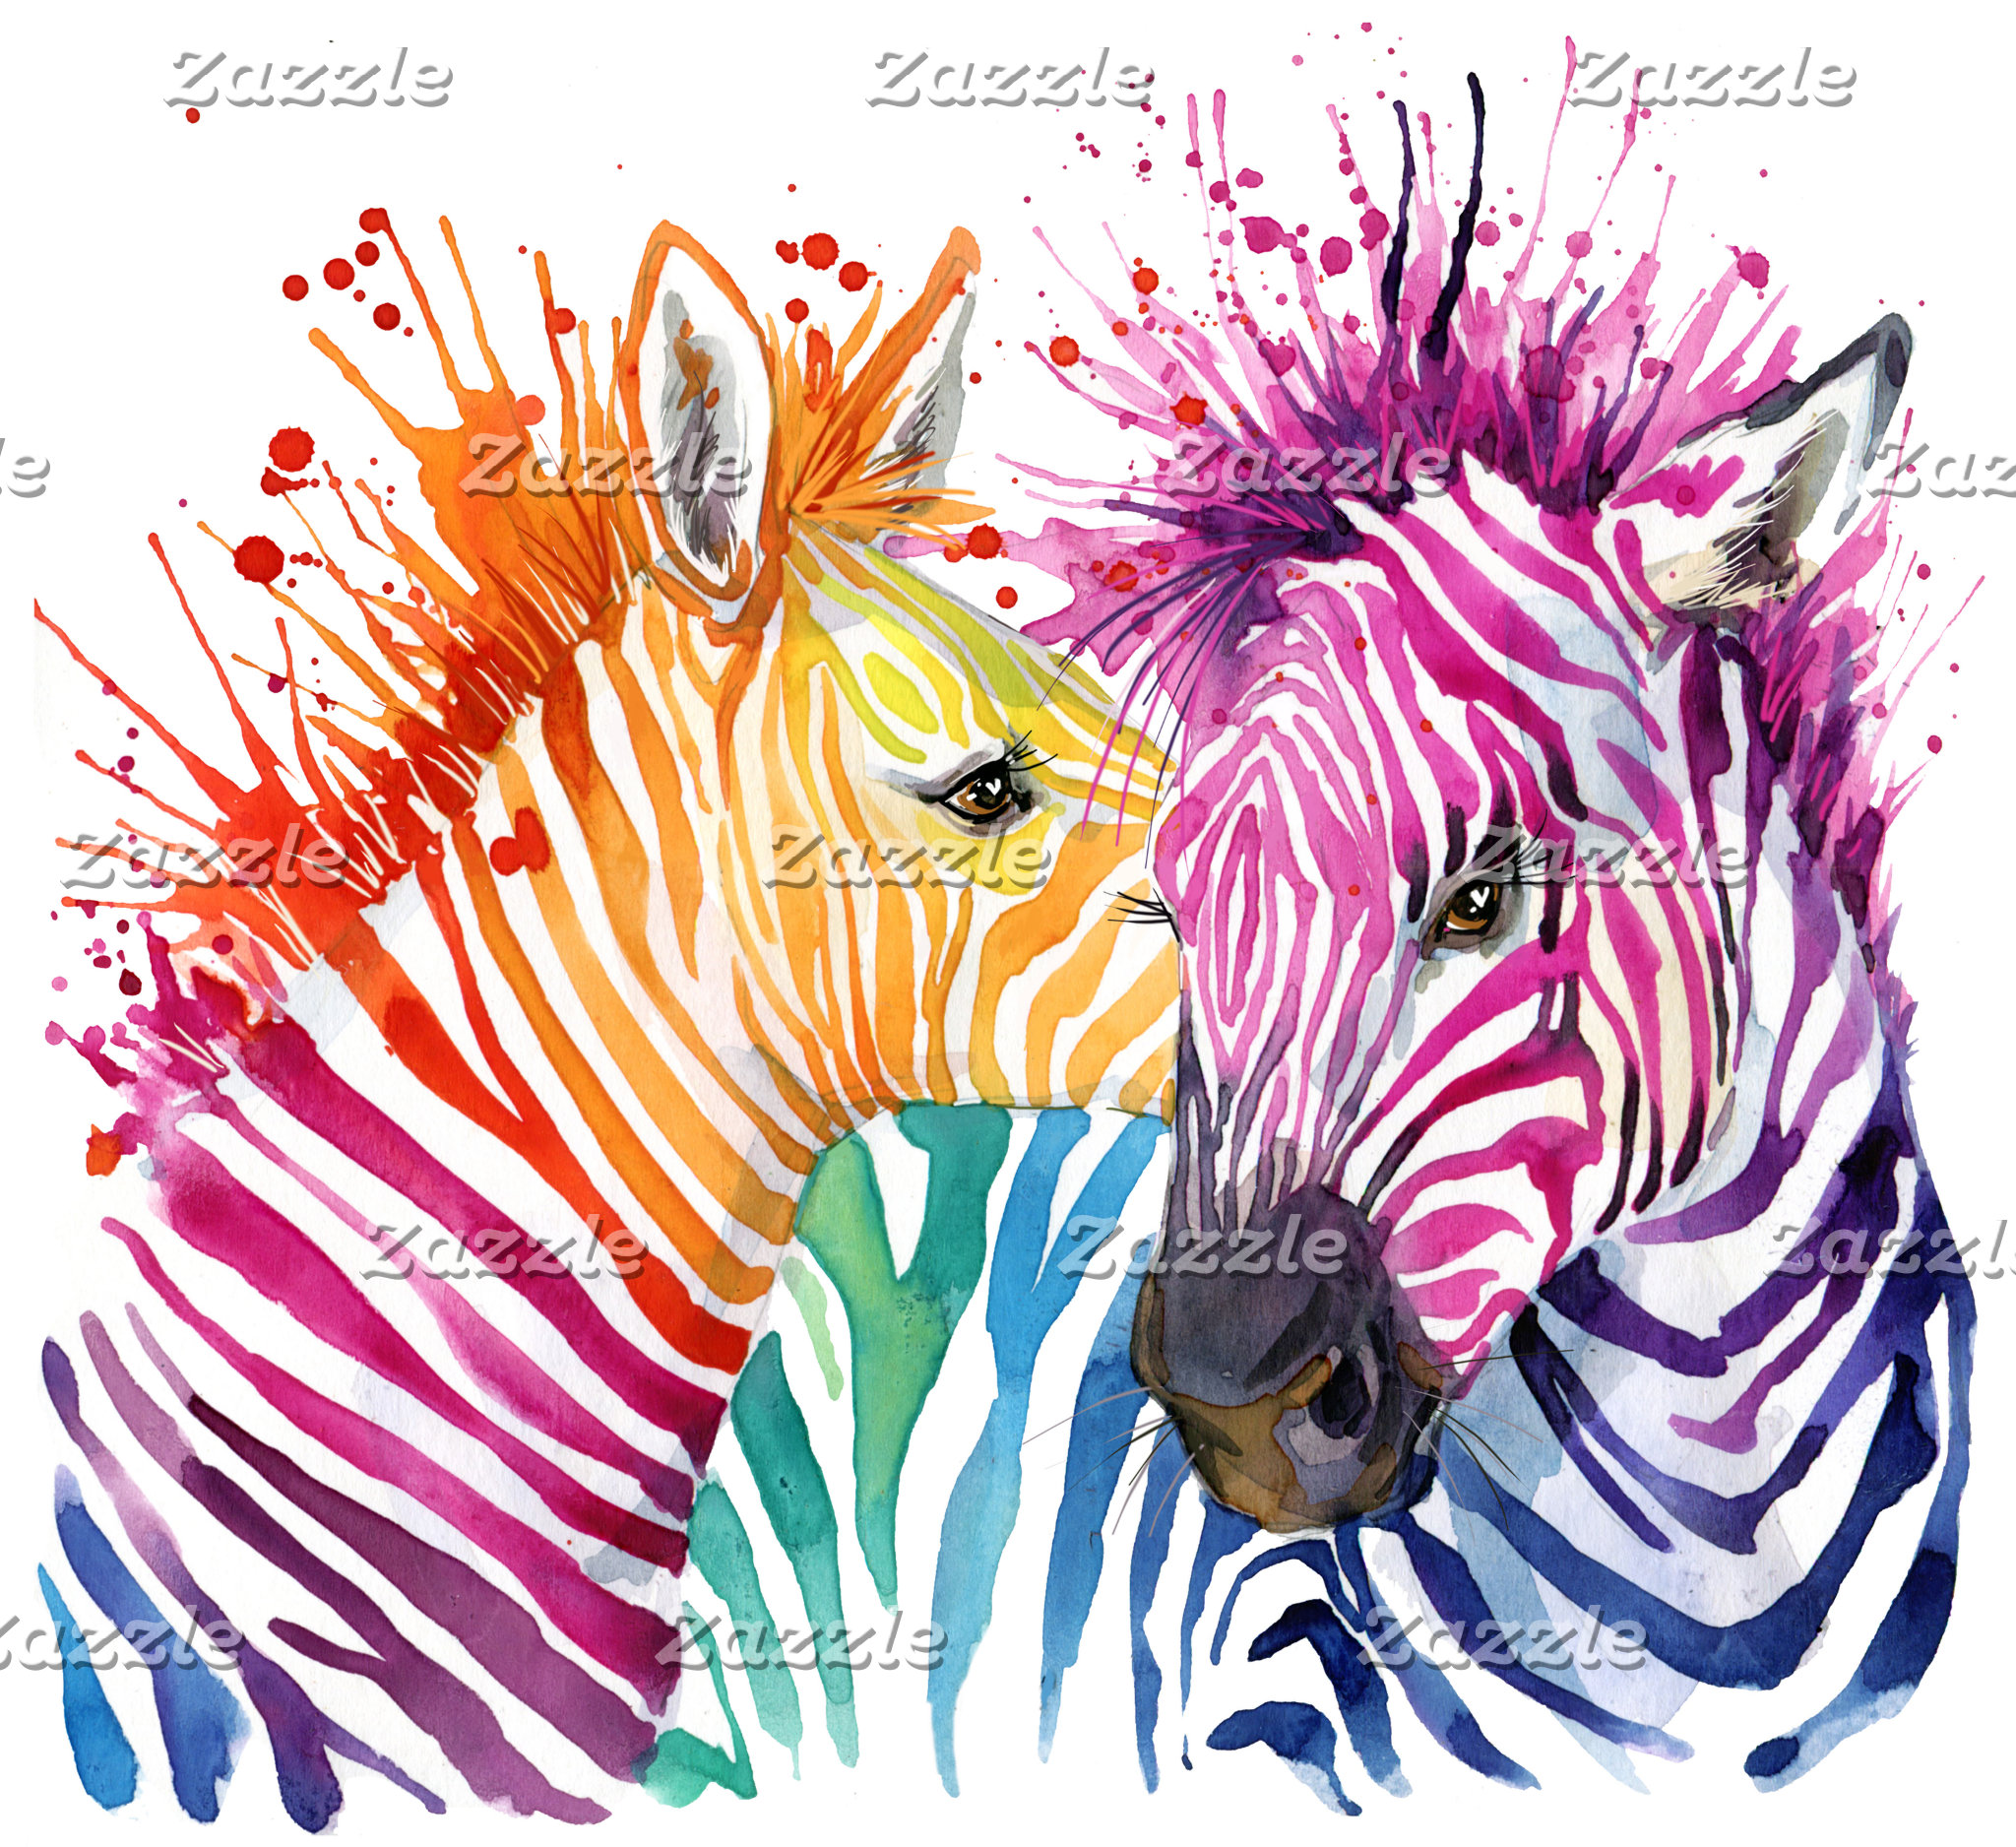 Zebra LOVE gifts!